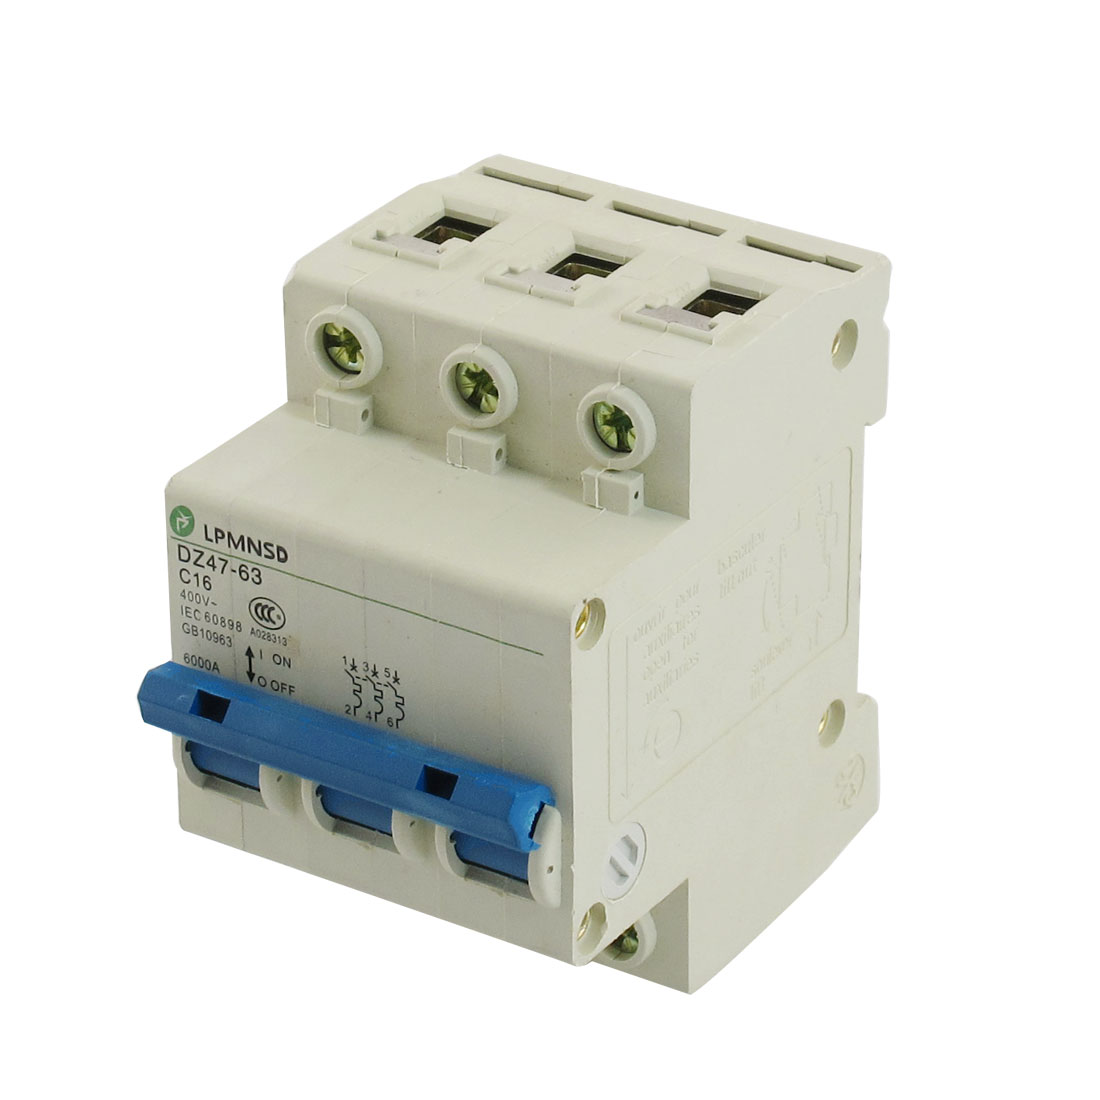 DZ47-63 C16 16A 400VAC 6000A Breaking Capacity 3 Poles Circuit Breaker